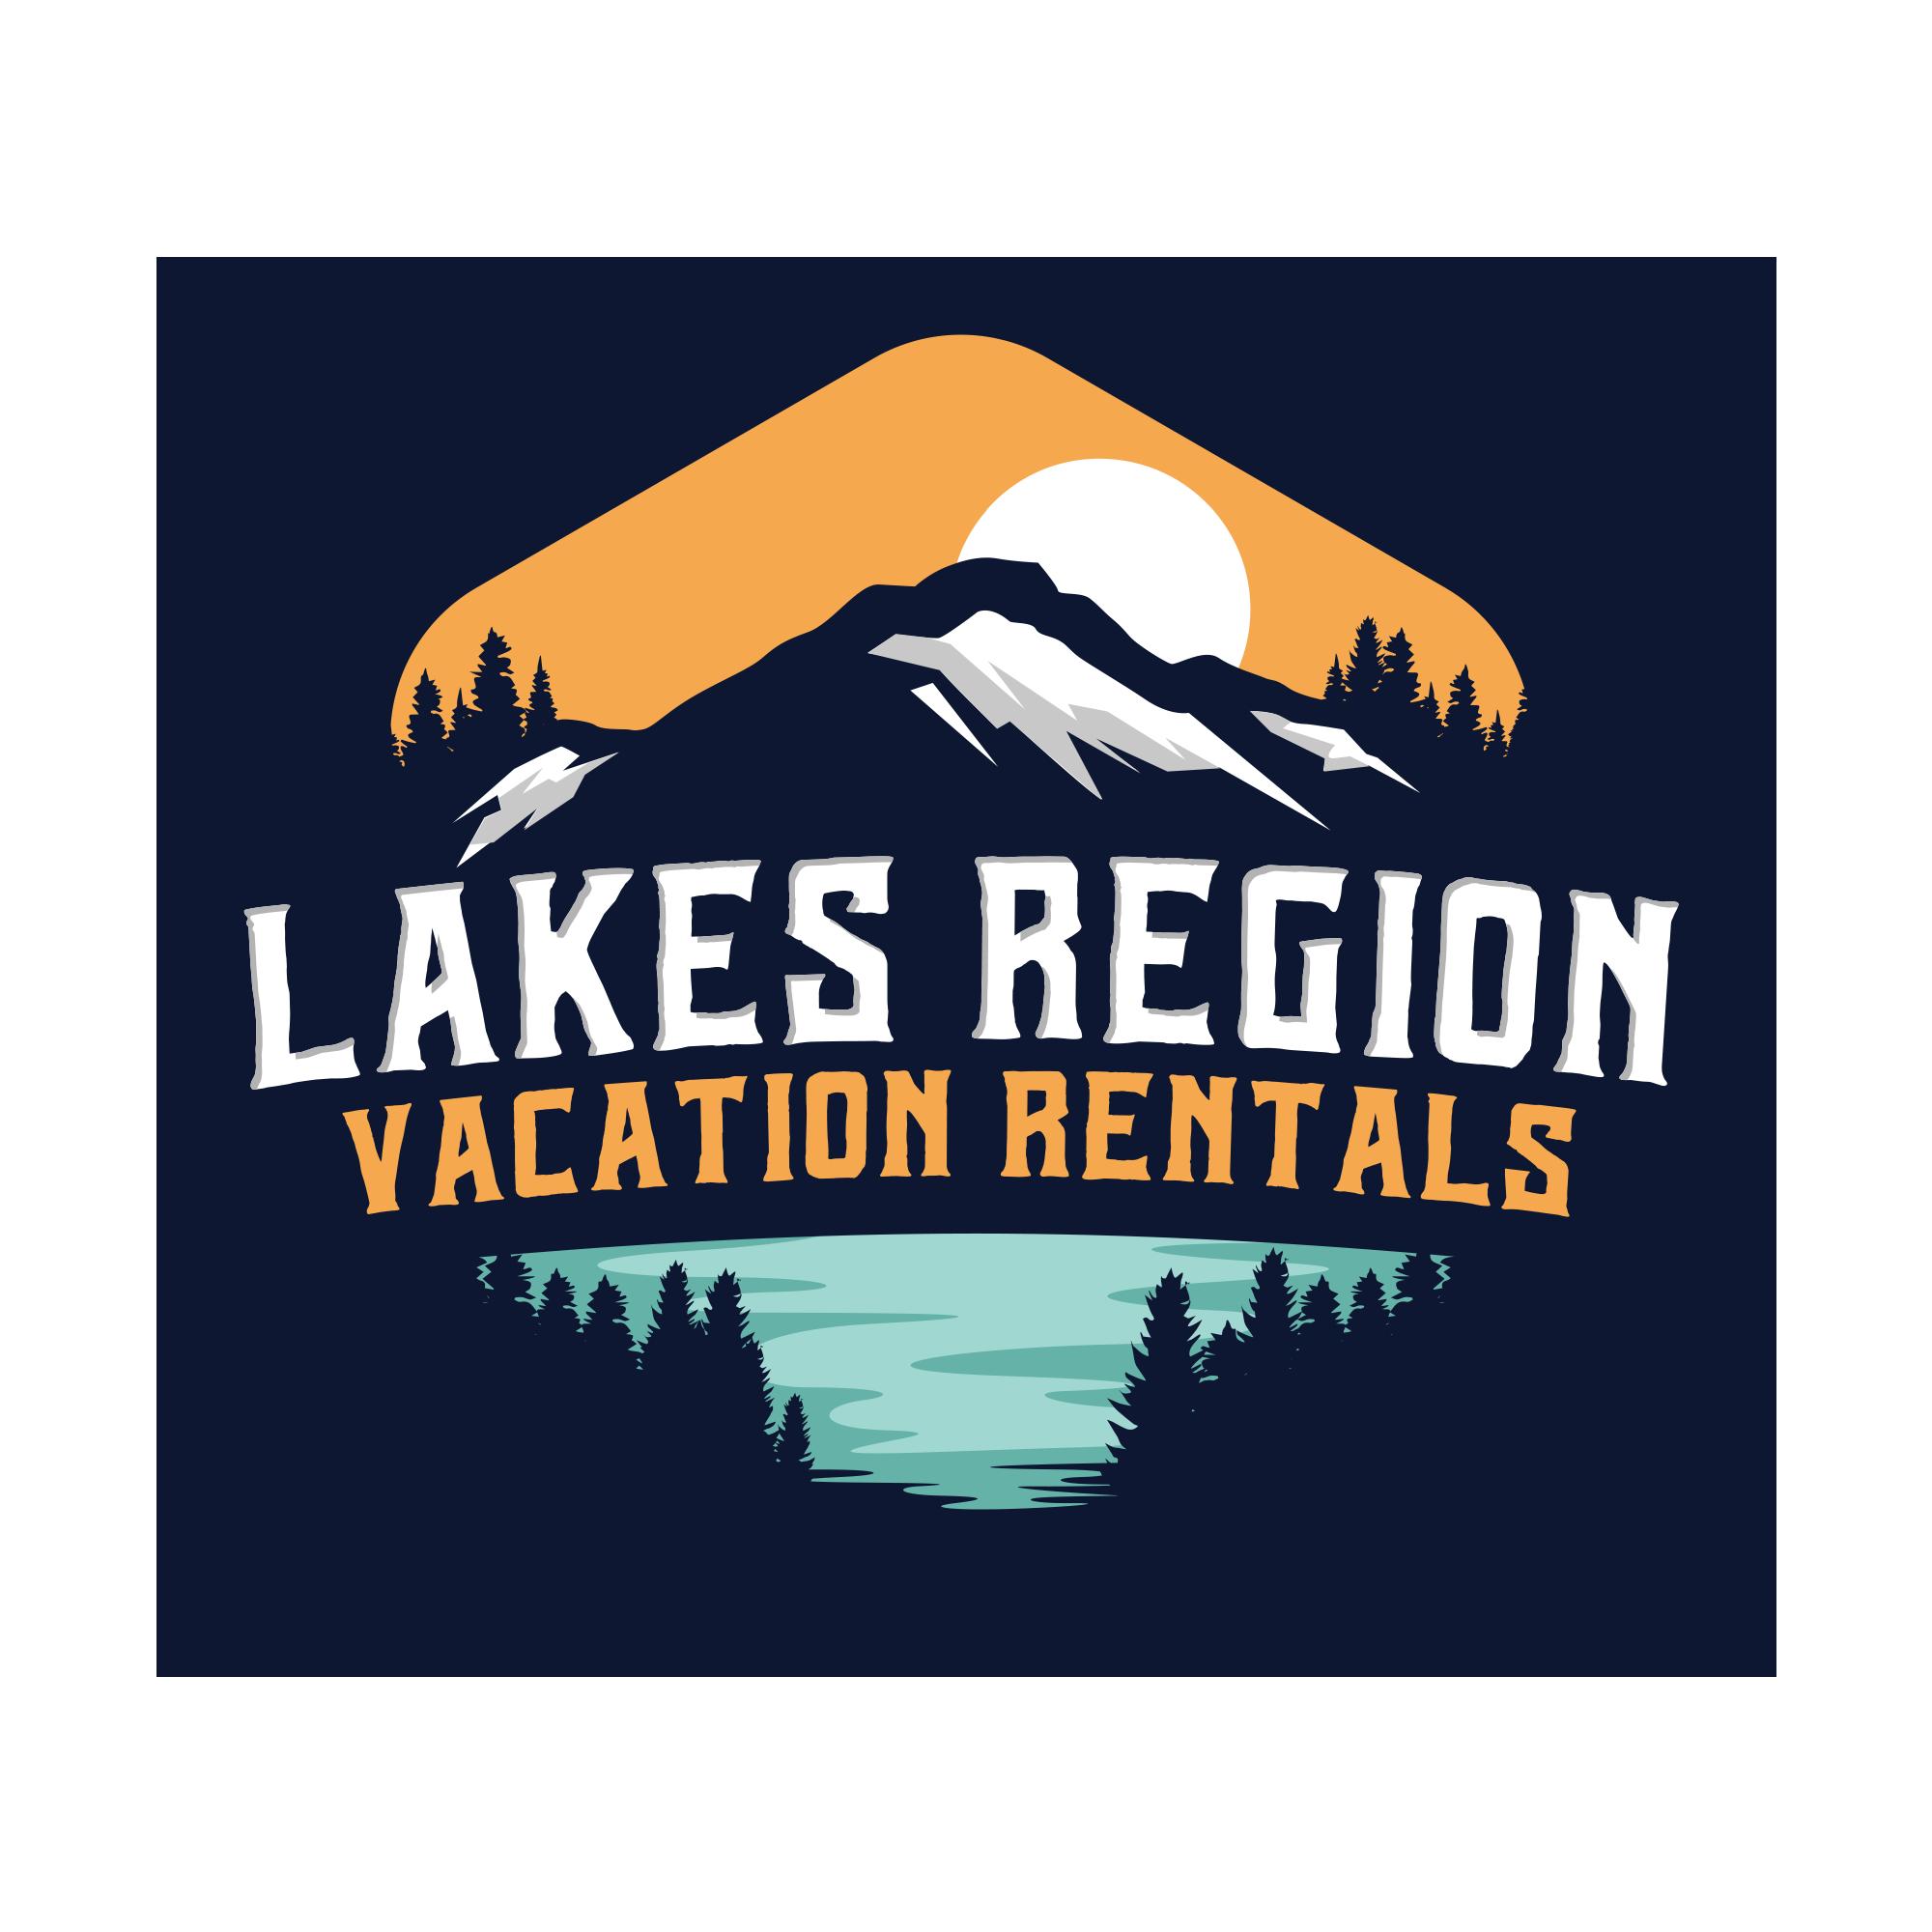 Lakes Region Vacation Rentals